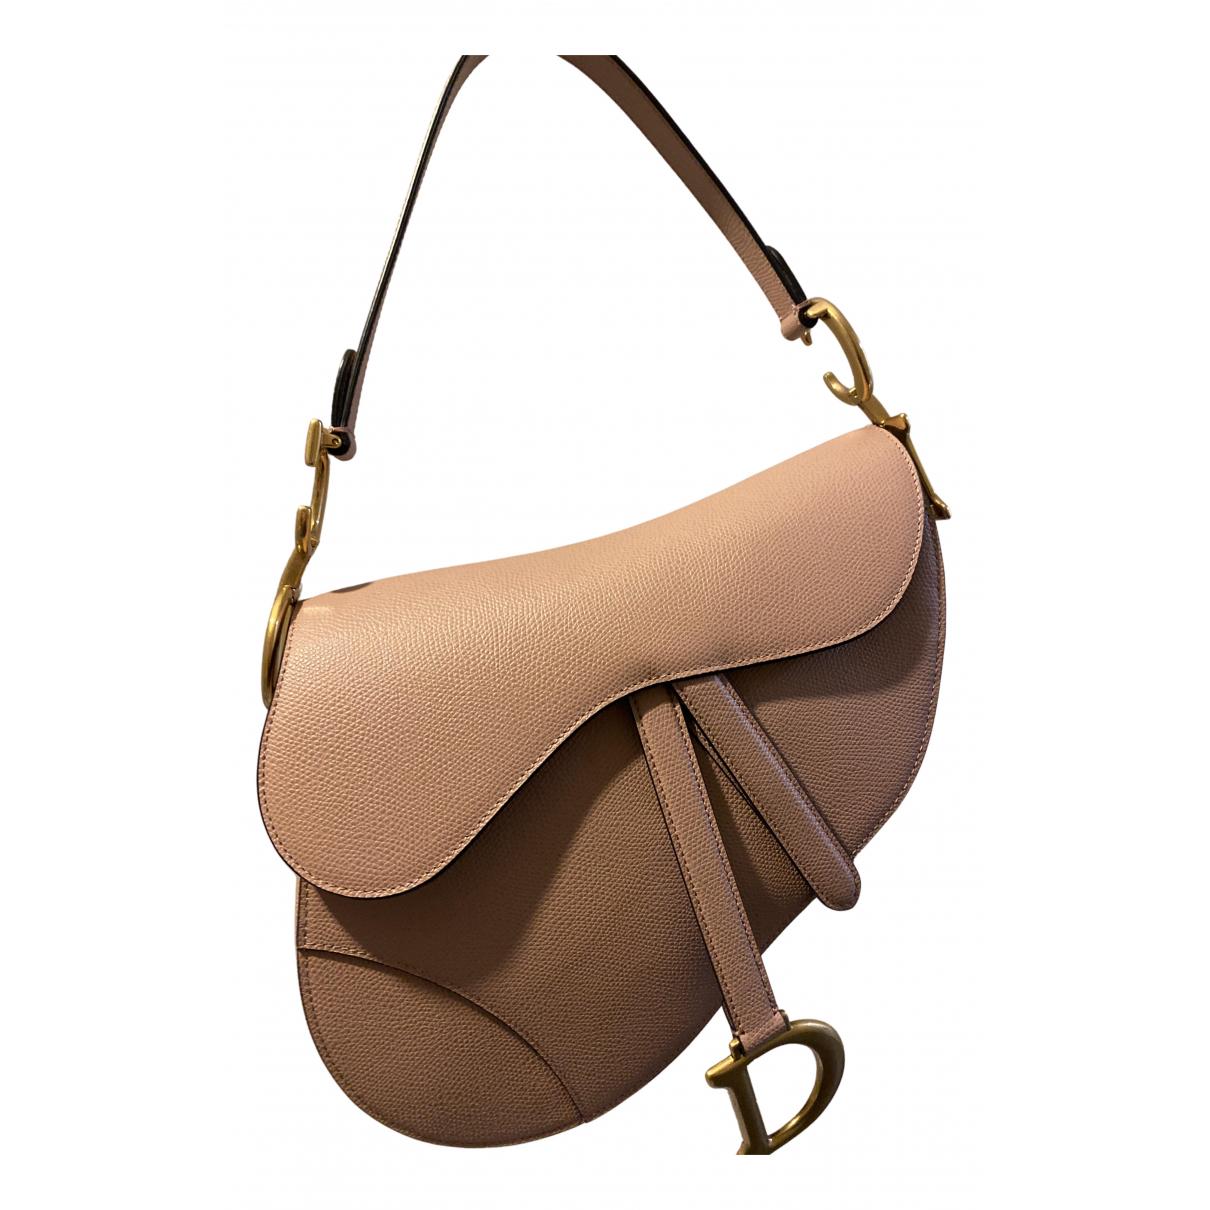 Dior - Sac a main Saddle pour femme en cuir